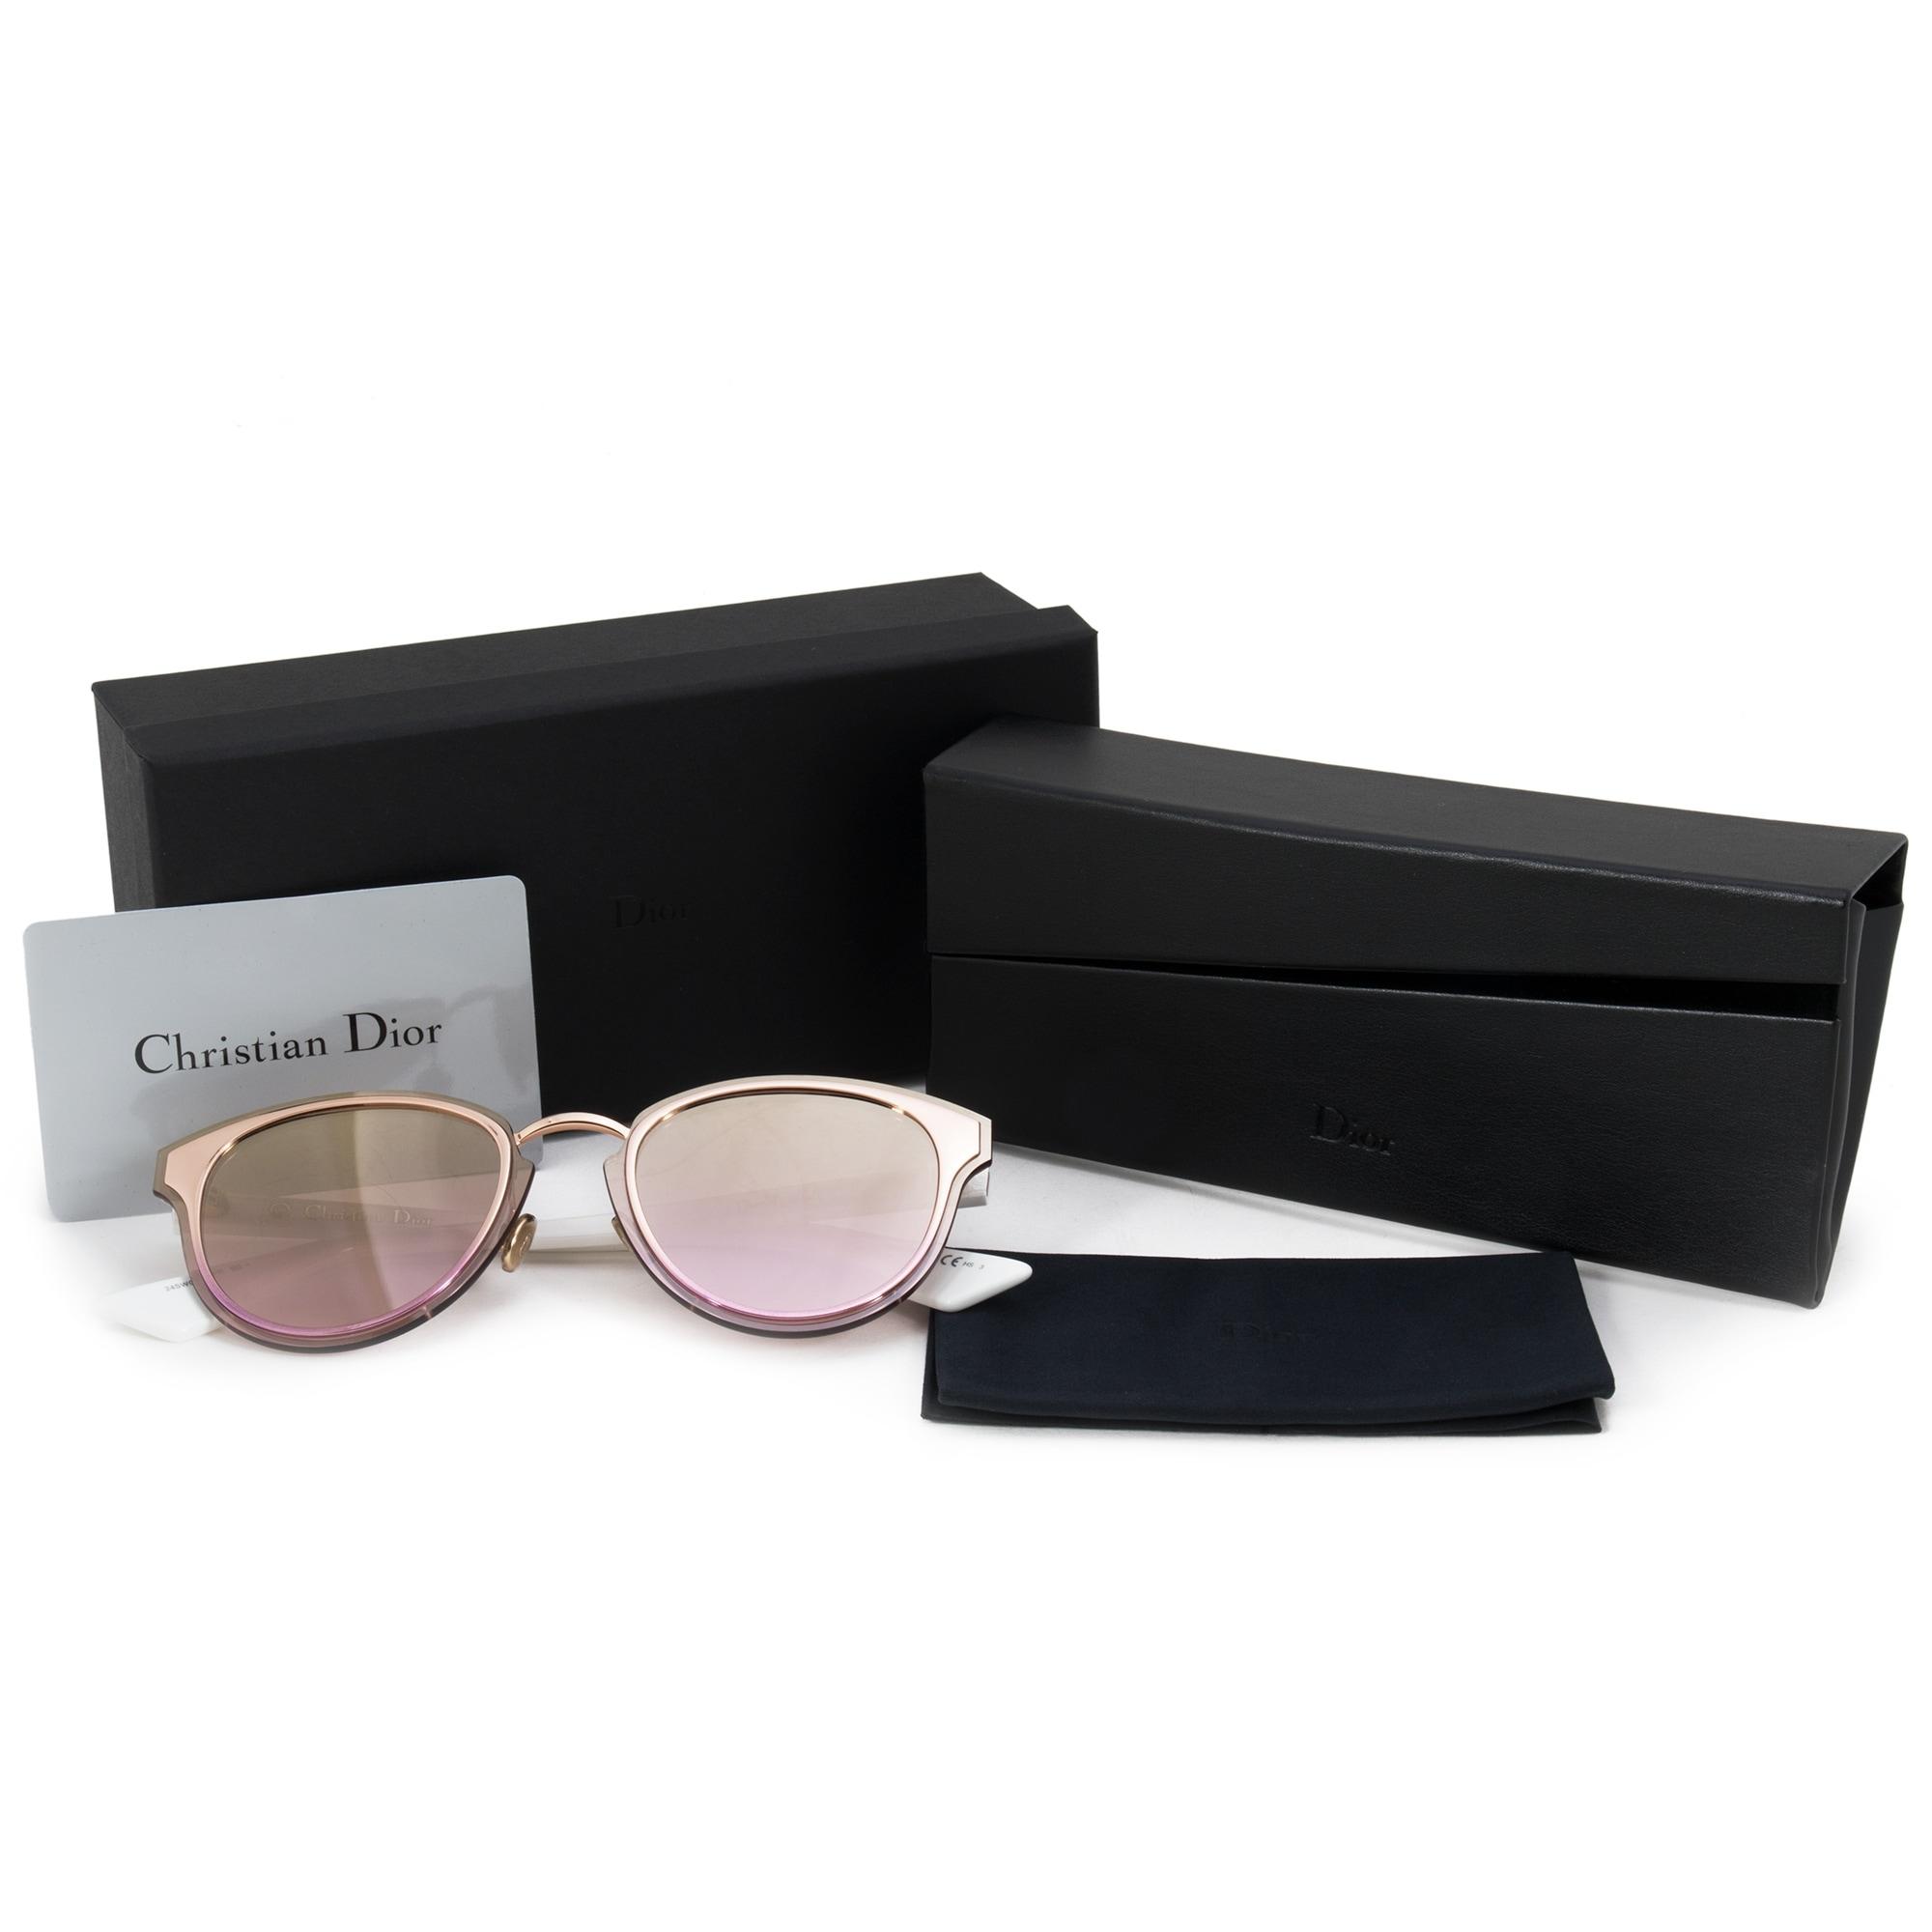 0b62c75d40 Shop Christian Dior Nightfall Cat Eye Sunglasses 24SWO 65 - Free Shipping  Today - Overstock - 25895087